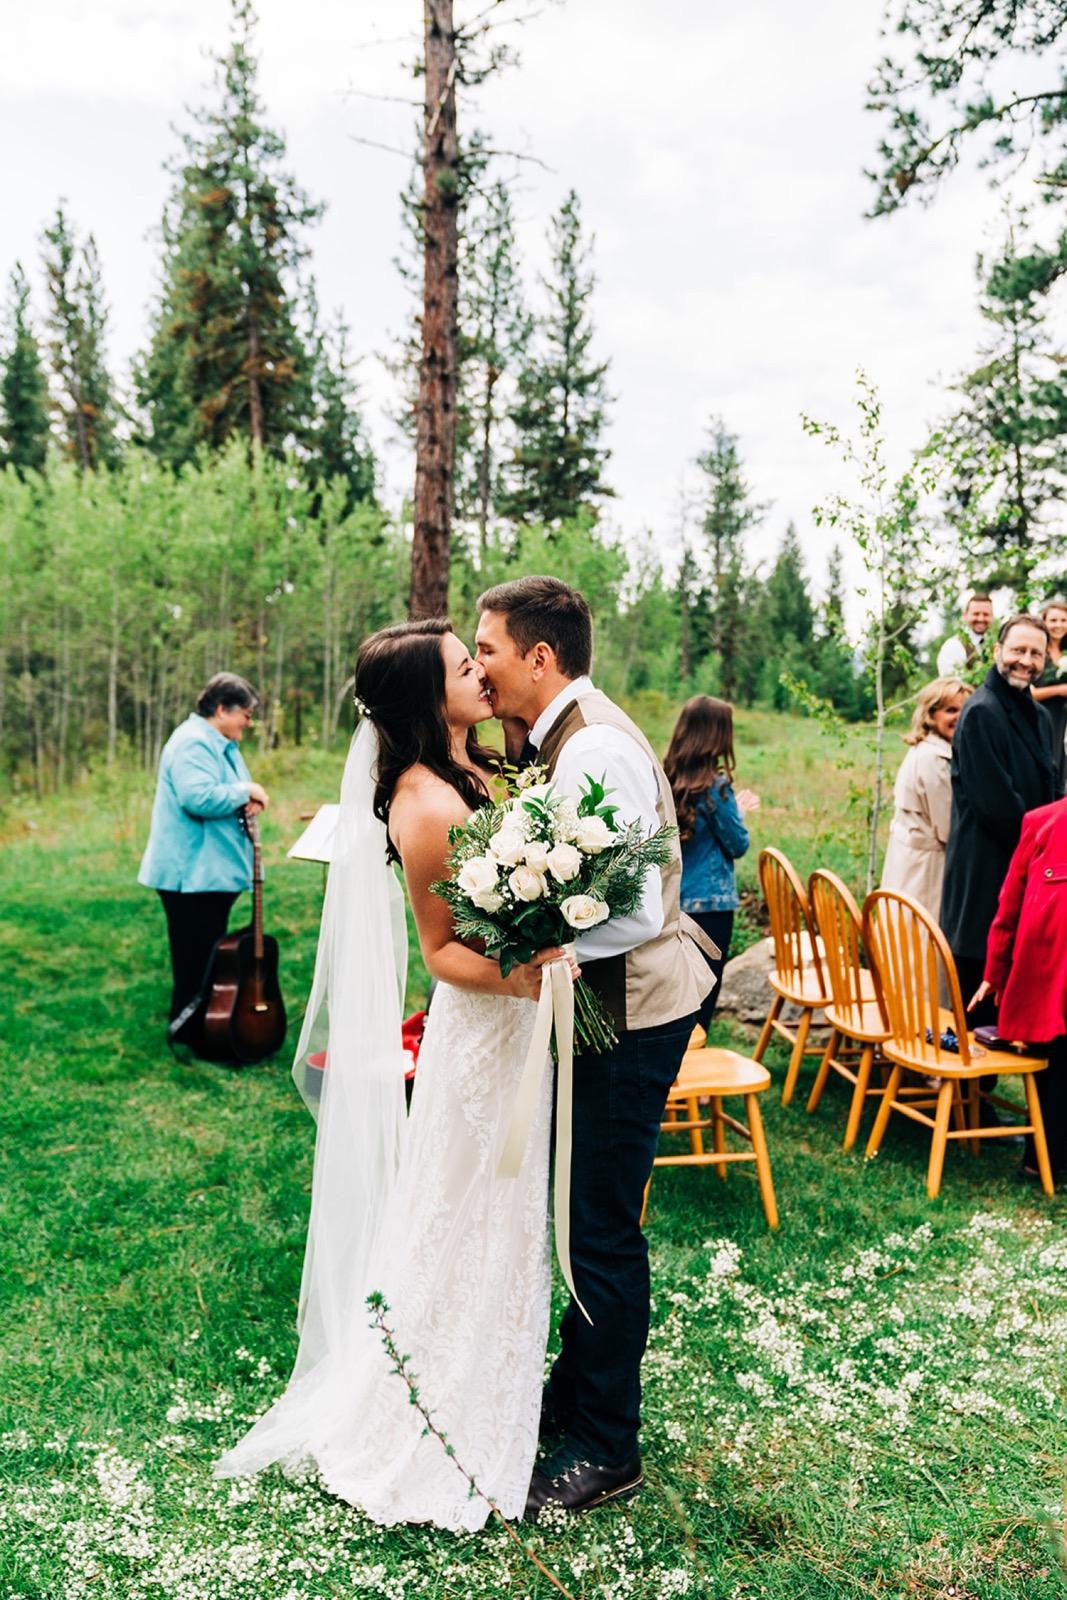 064_katie_chris_wedding-146.jpg